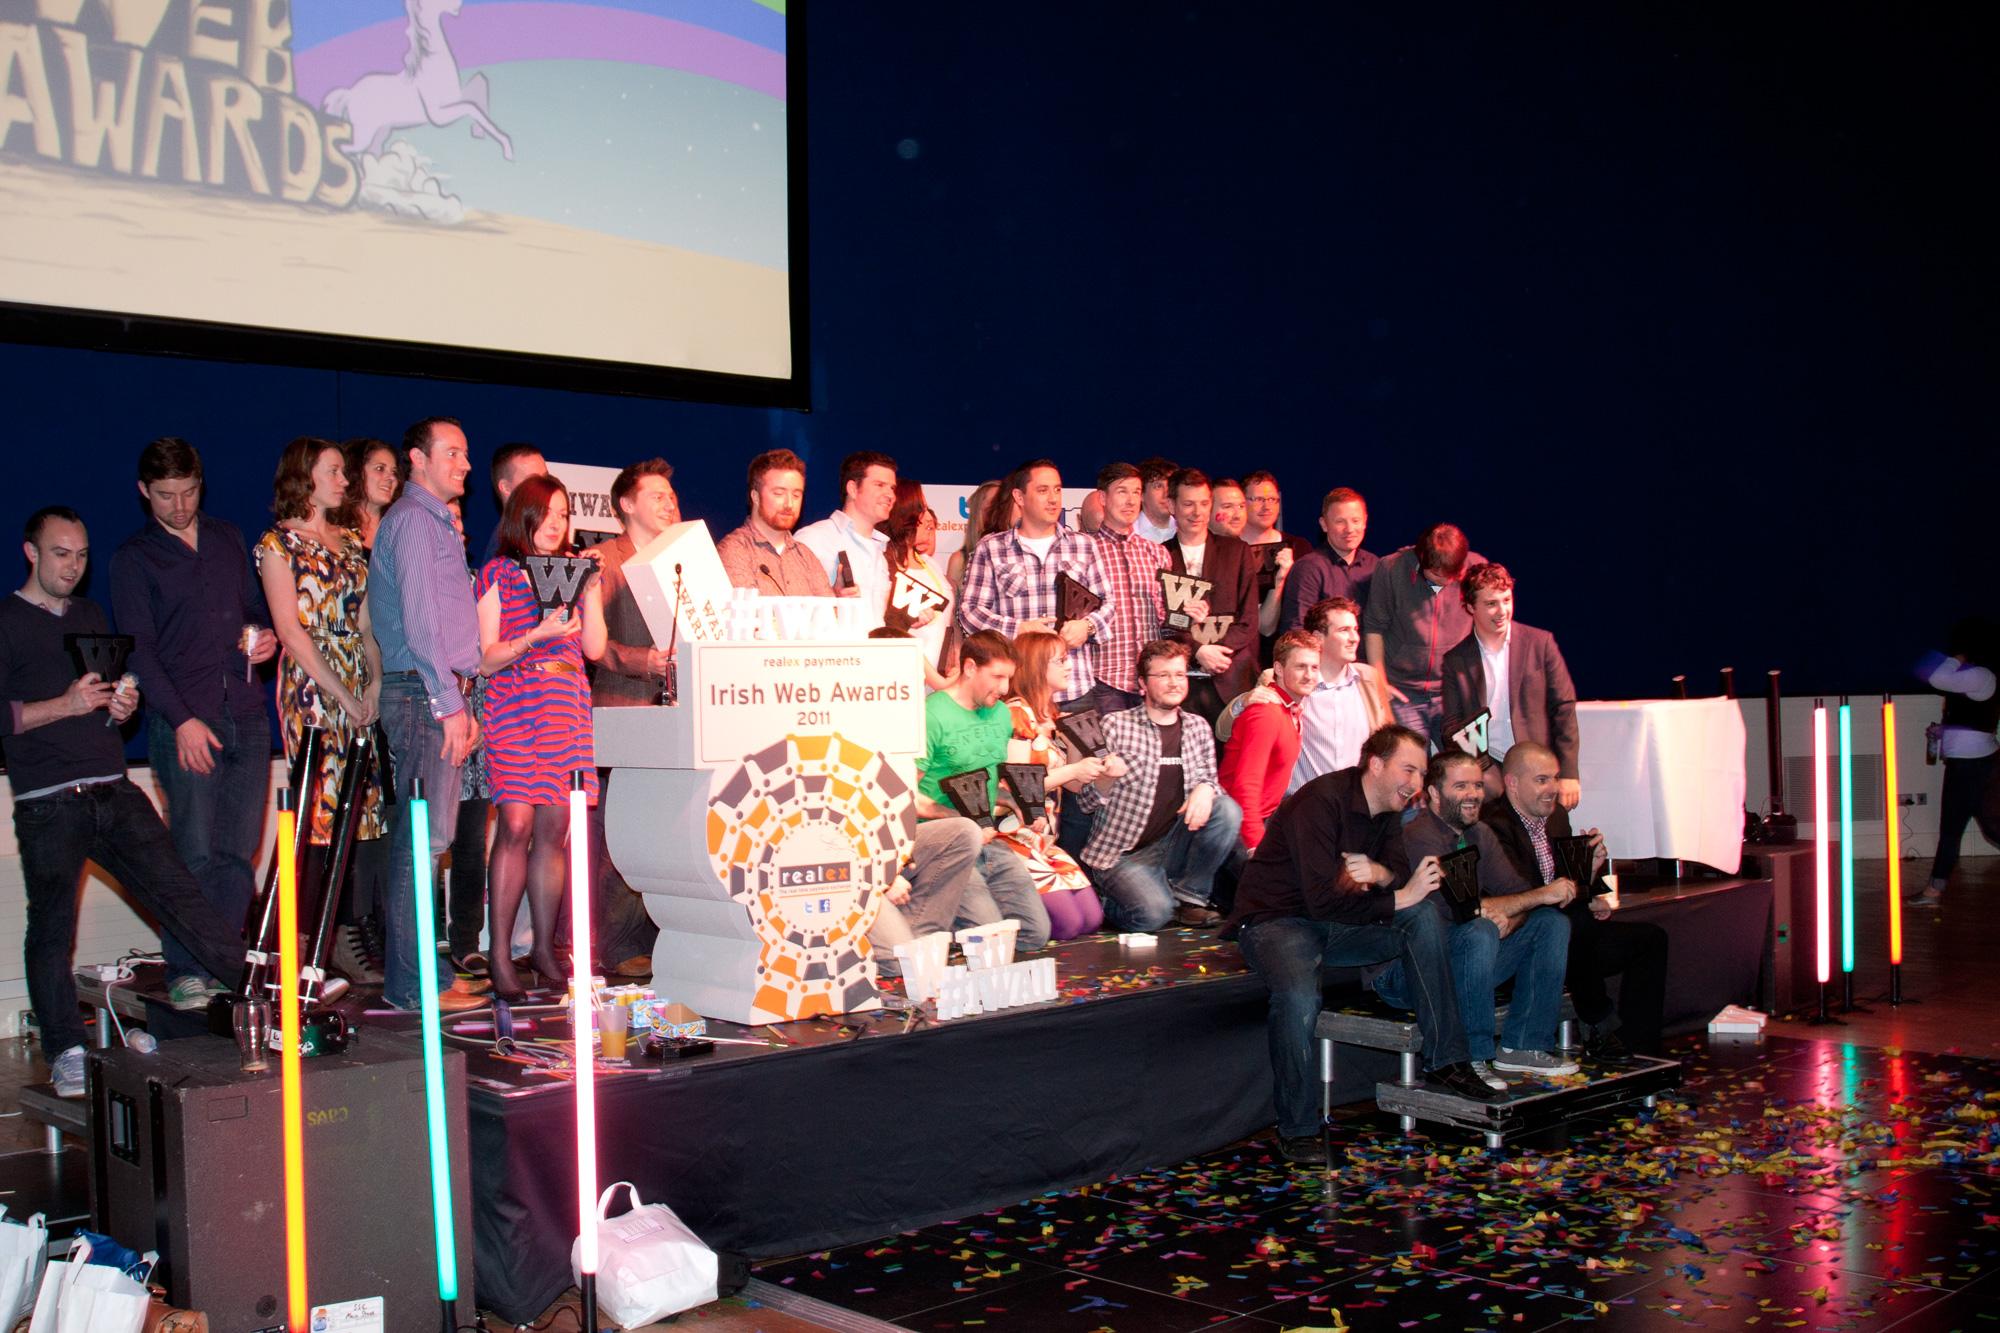 2011 Irish Web Awards Winners